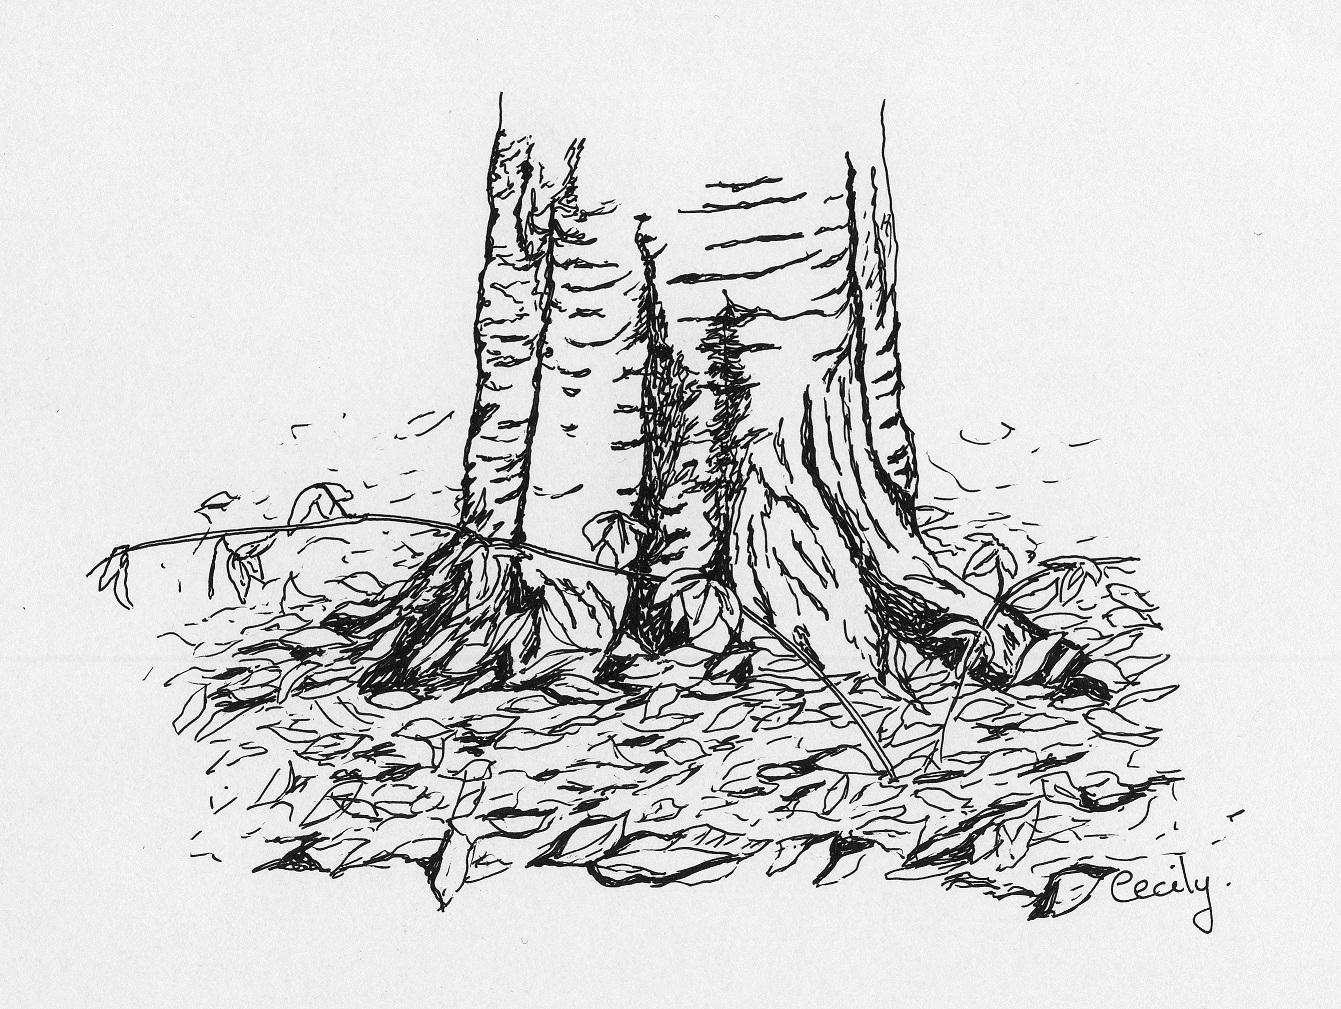 tree sketch | ButterflyHands